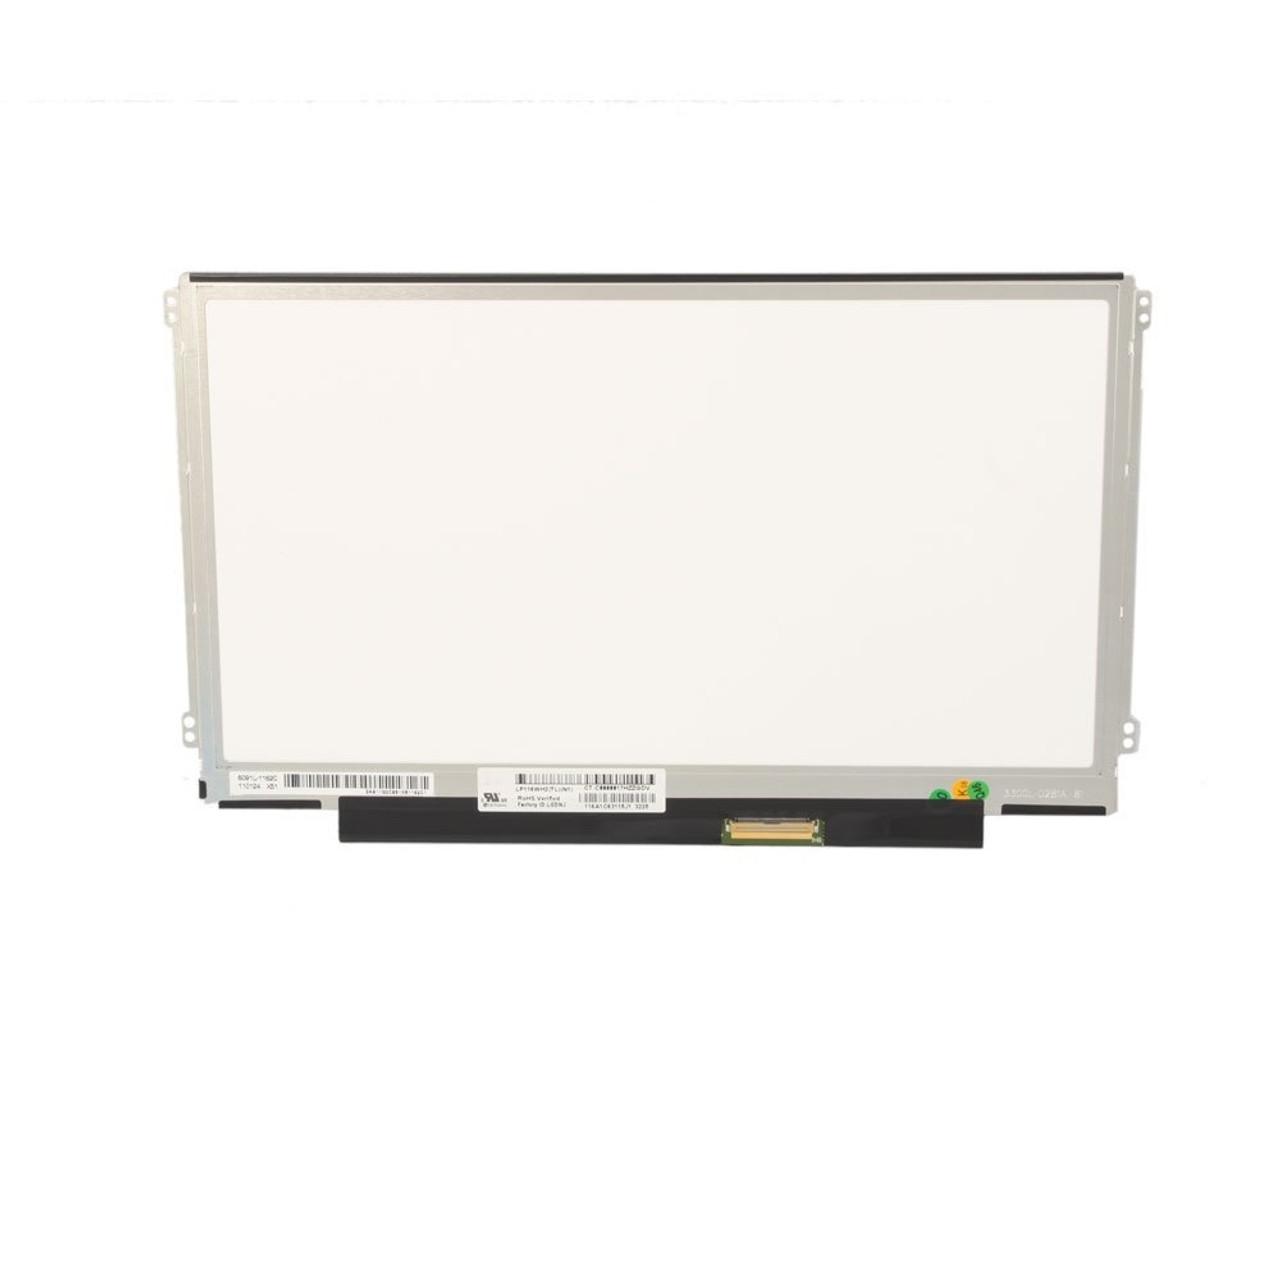 Samsung  XE303C12/XE503C12 Chromebook LCD Panel